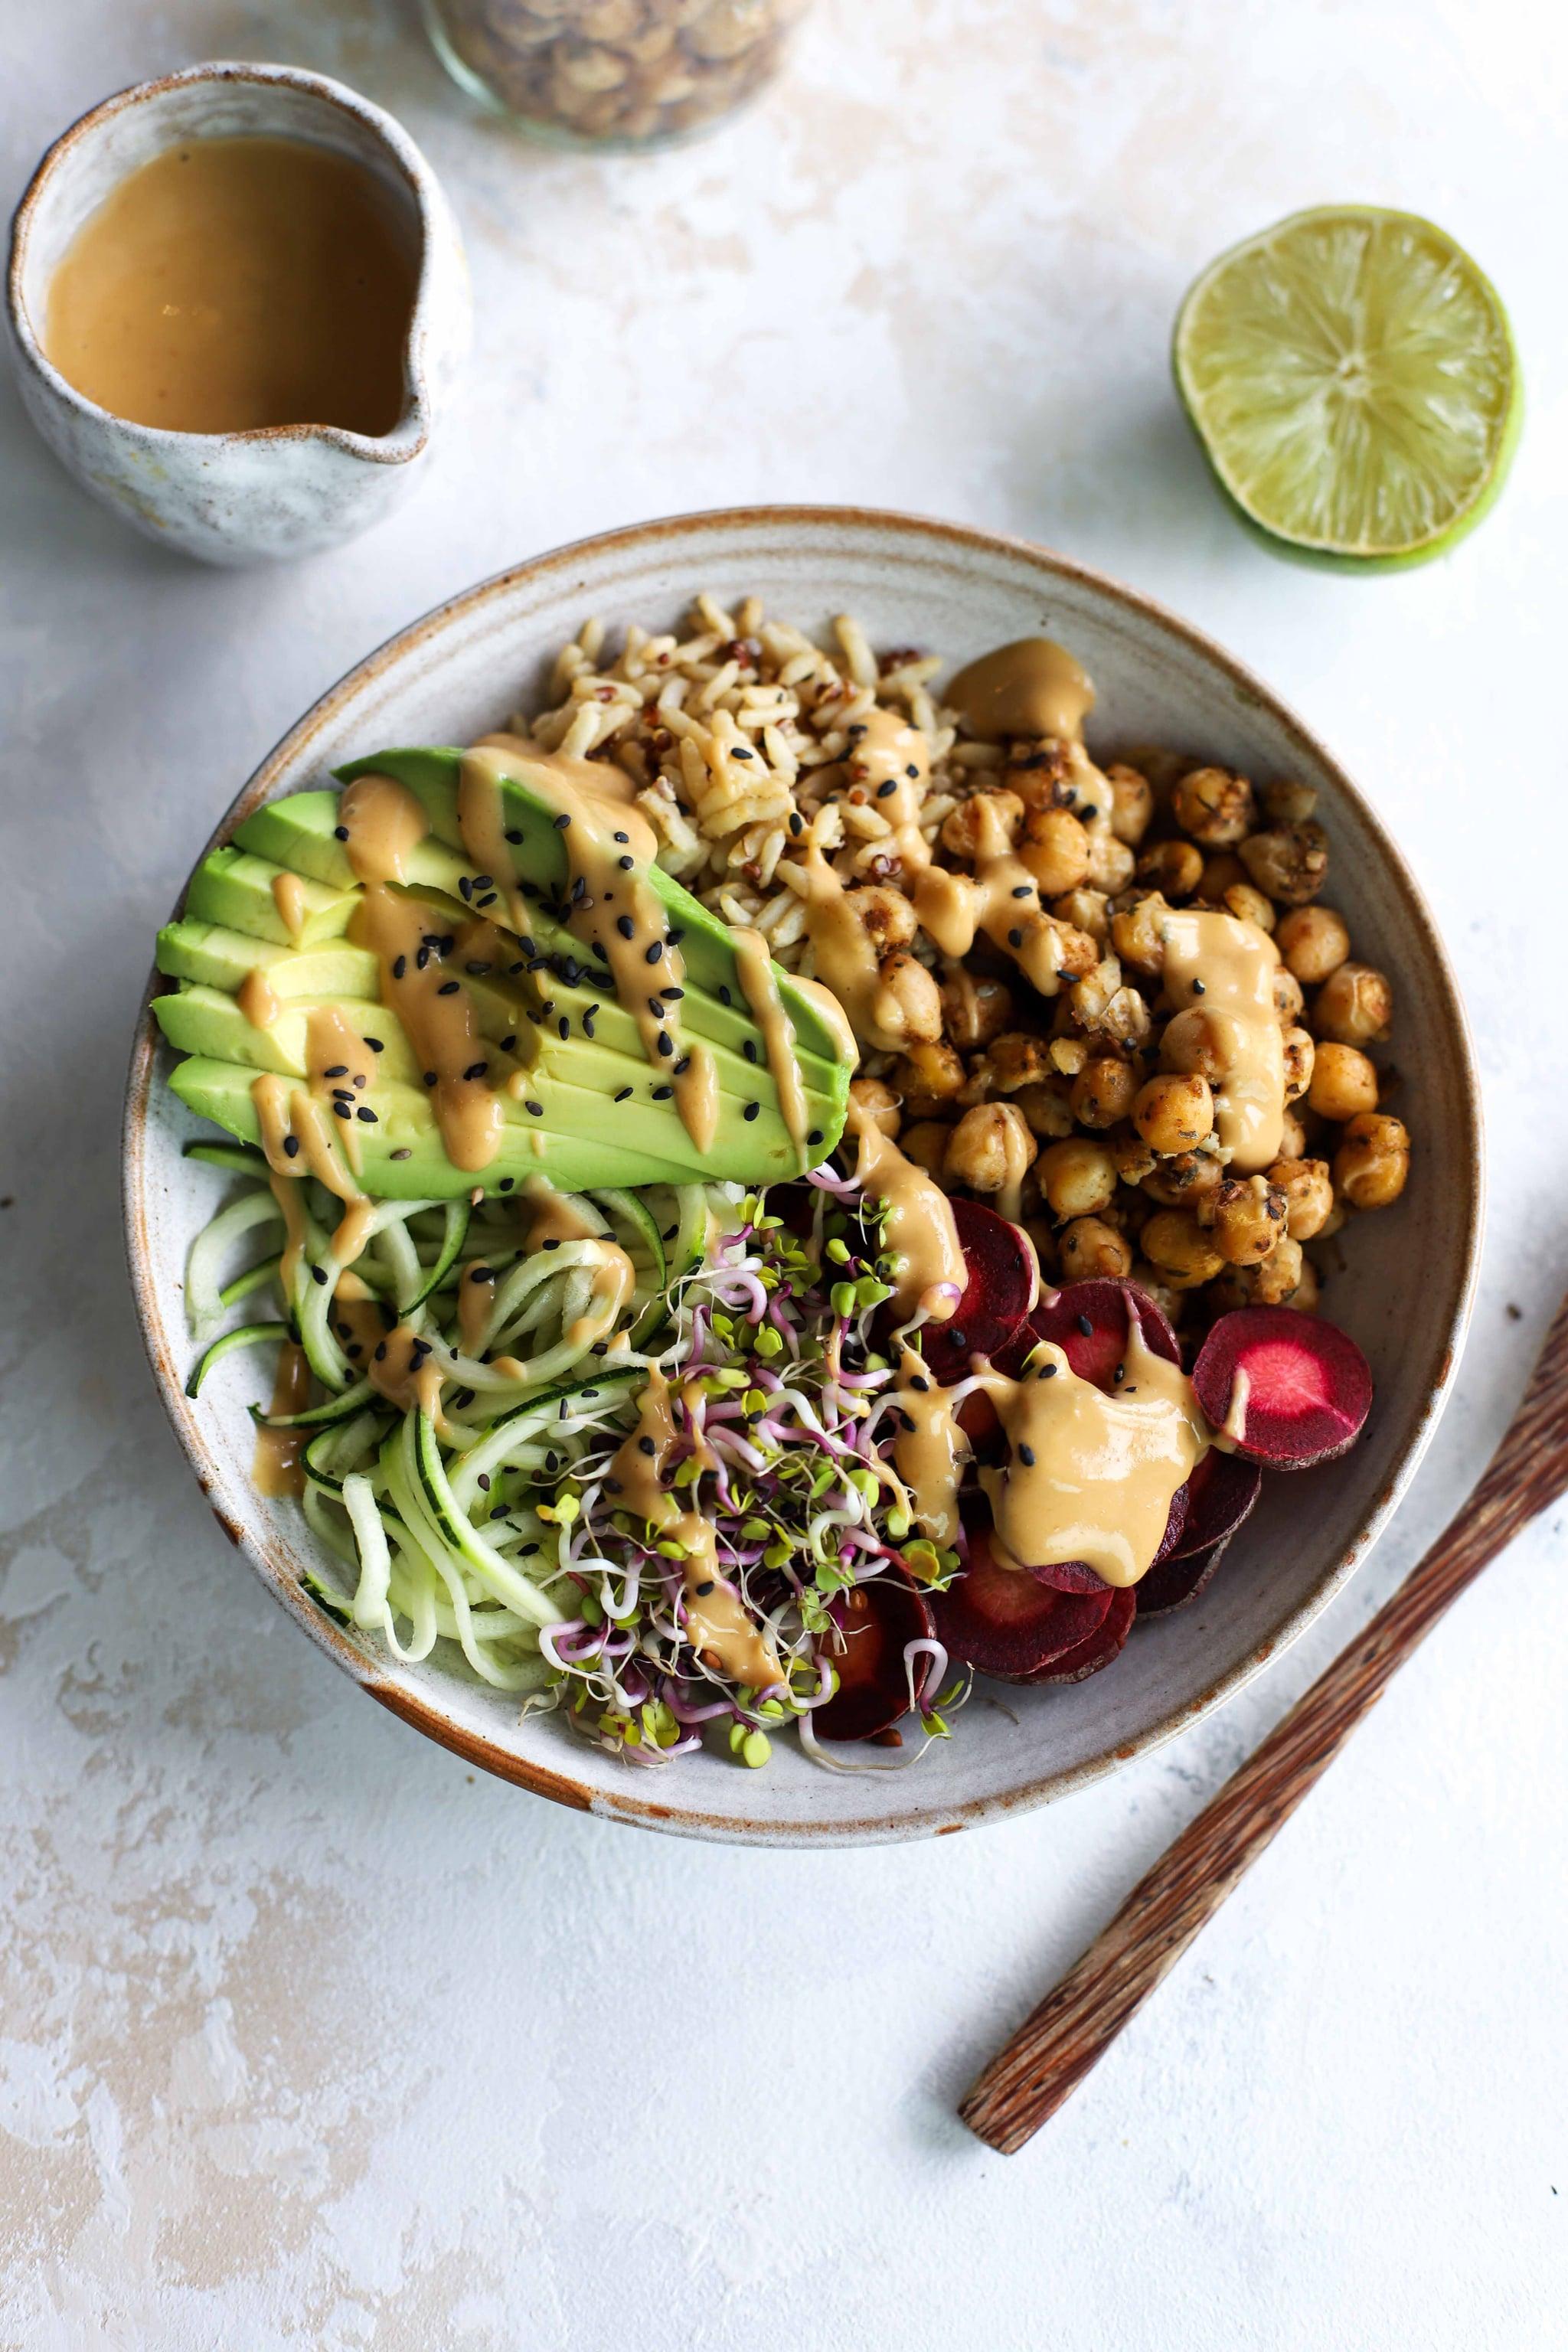 Peanut Butter Chickpea Satay Buddha Bowl Recipe | POPSUGAR Fitness Australia